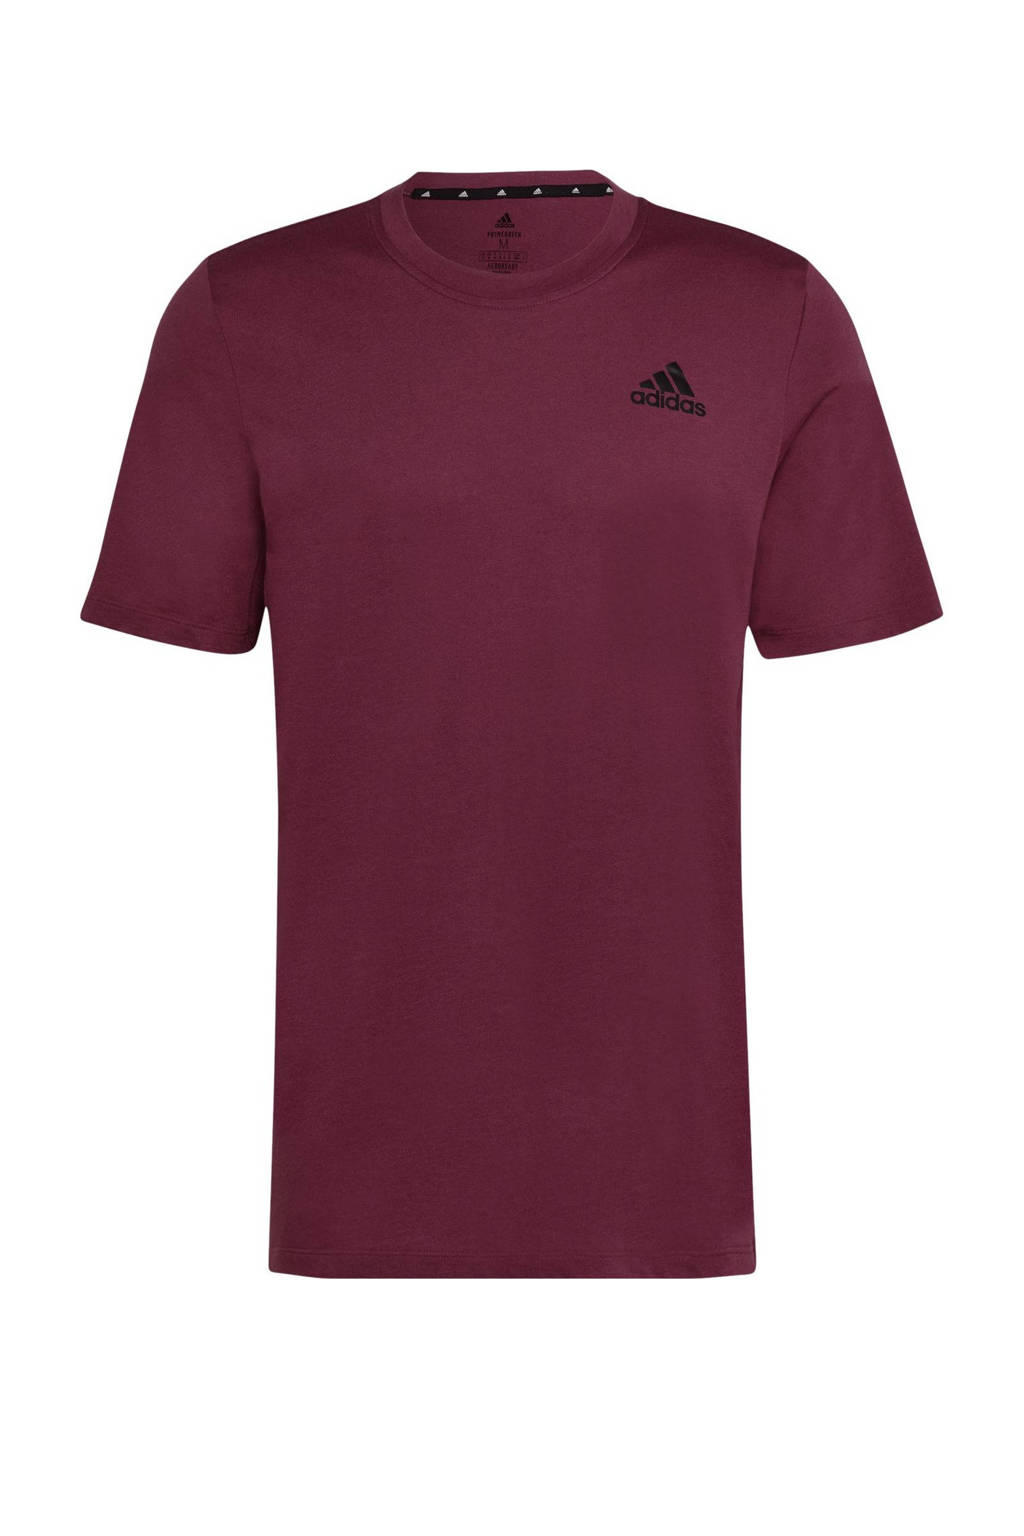 adidas Performance   Designed2Move sport T-shirt donkerrood, Donkerrood